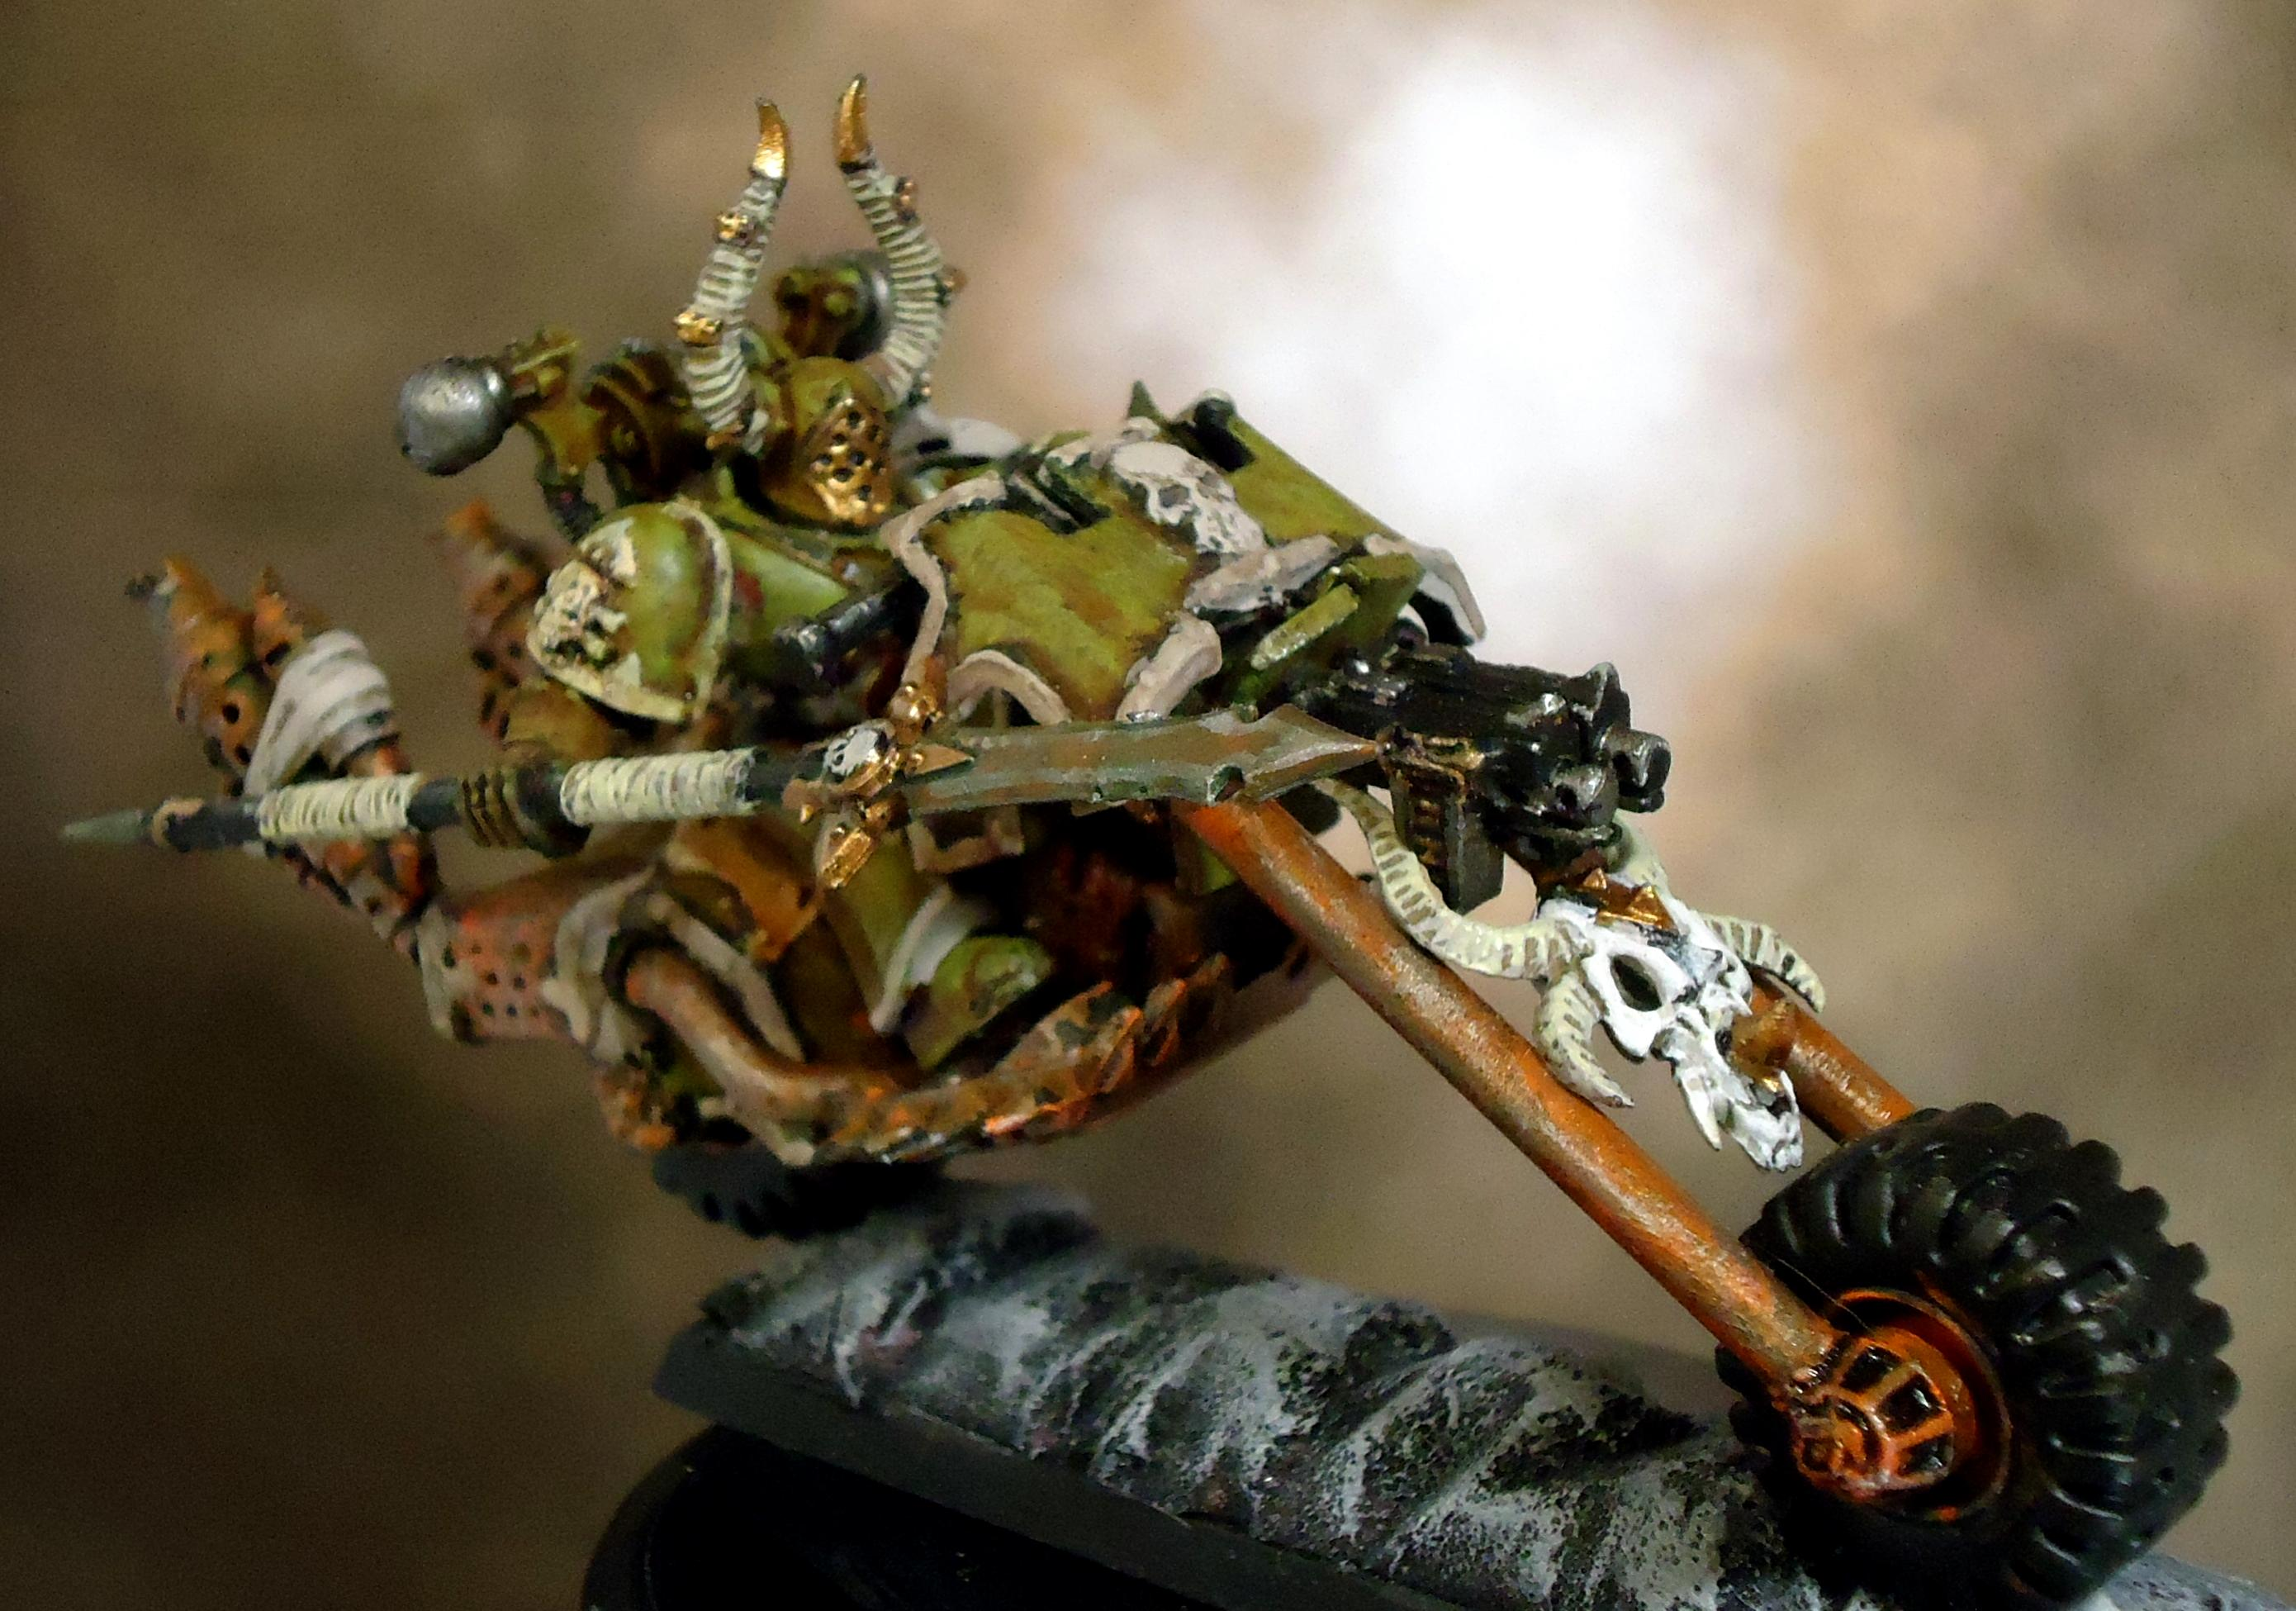 Bike, Chaos Space Marines, Death Guard, Decay, Nurgle, Rust